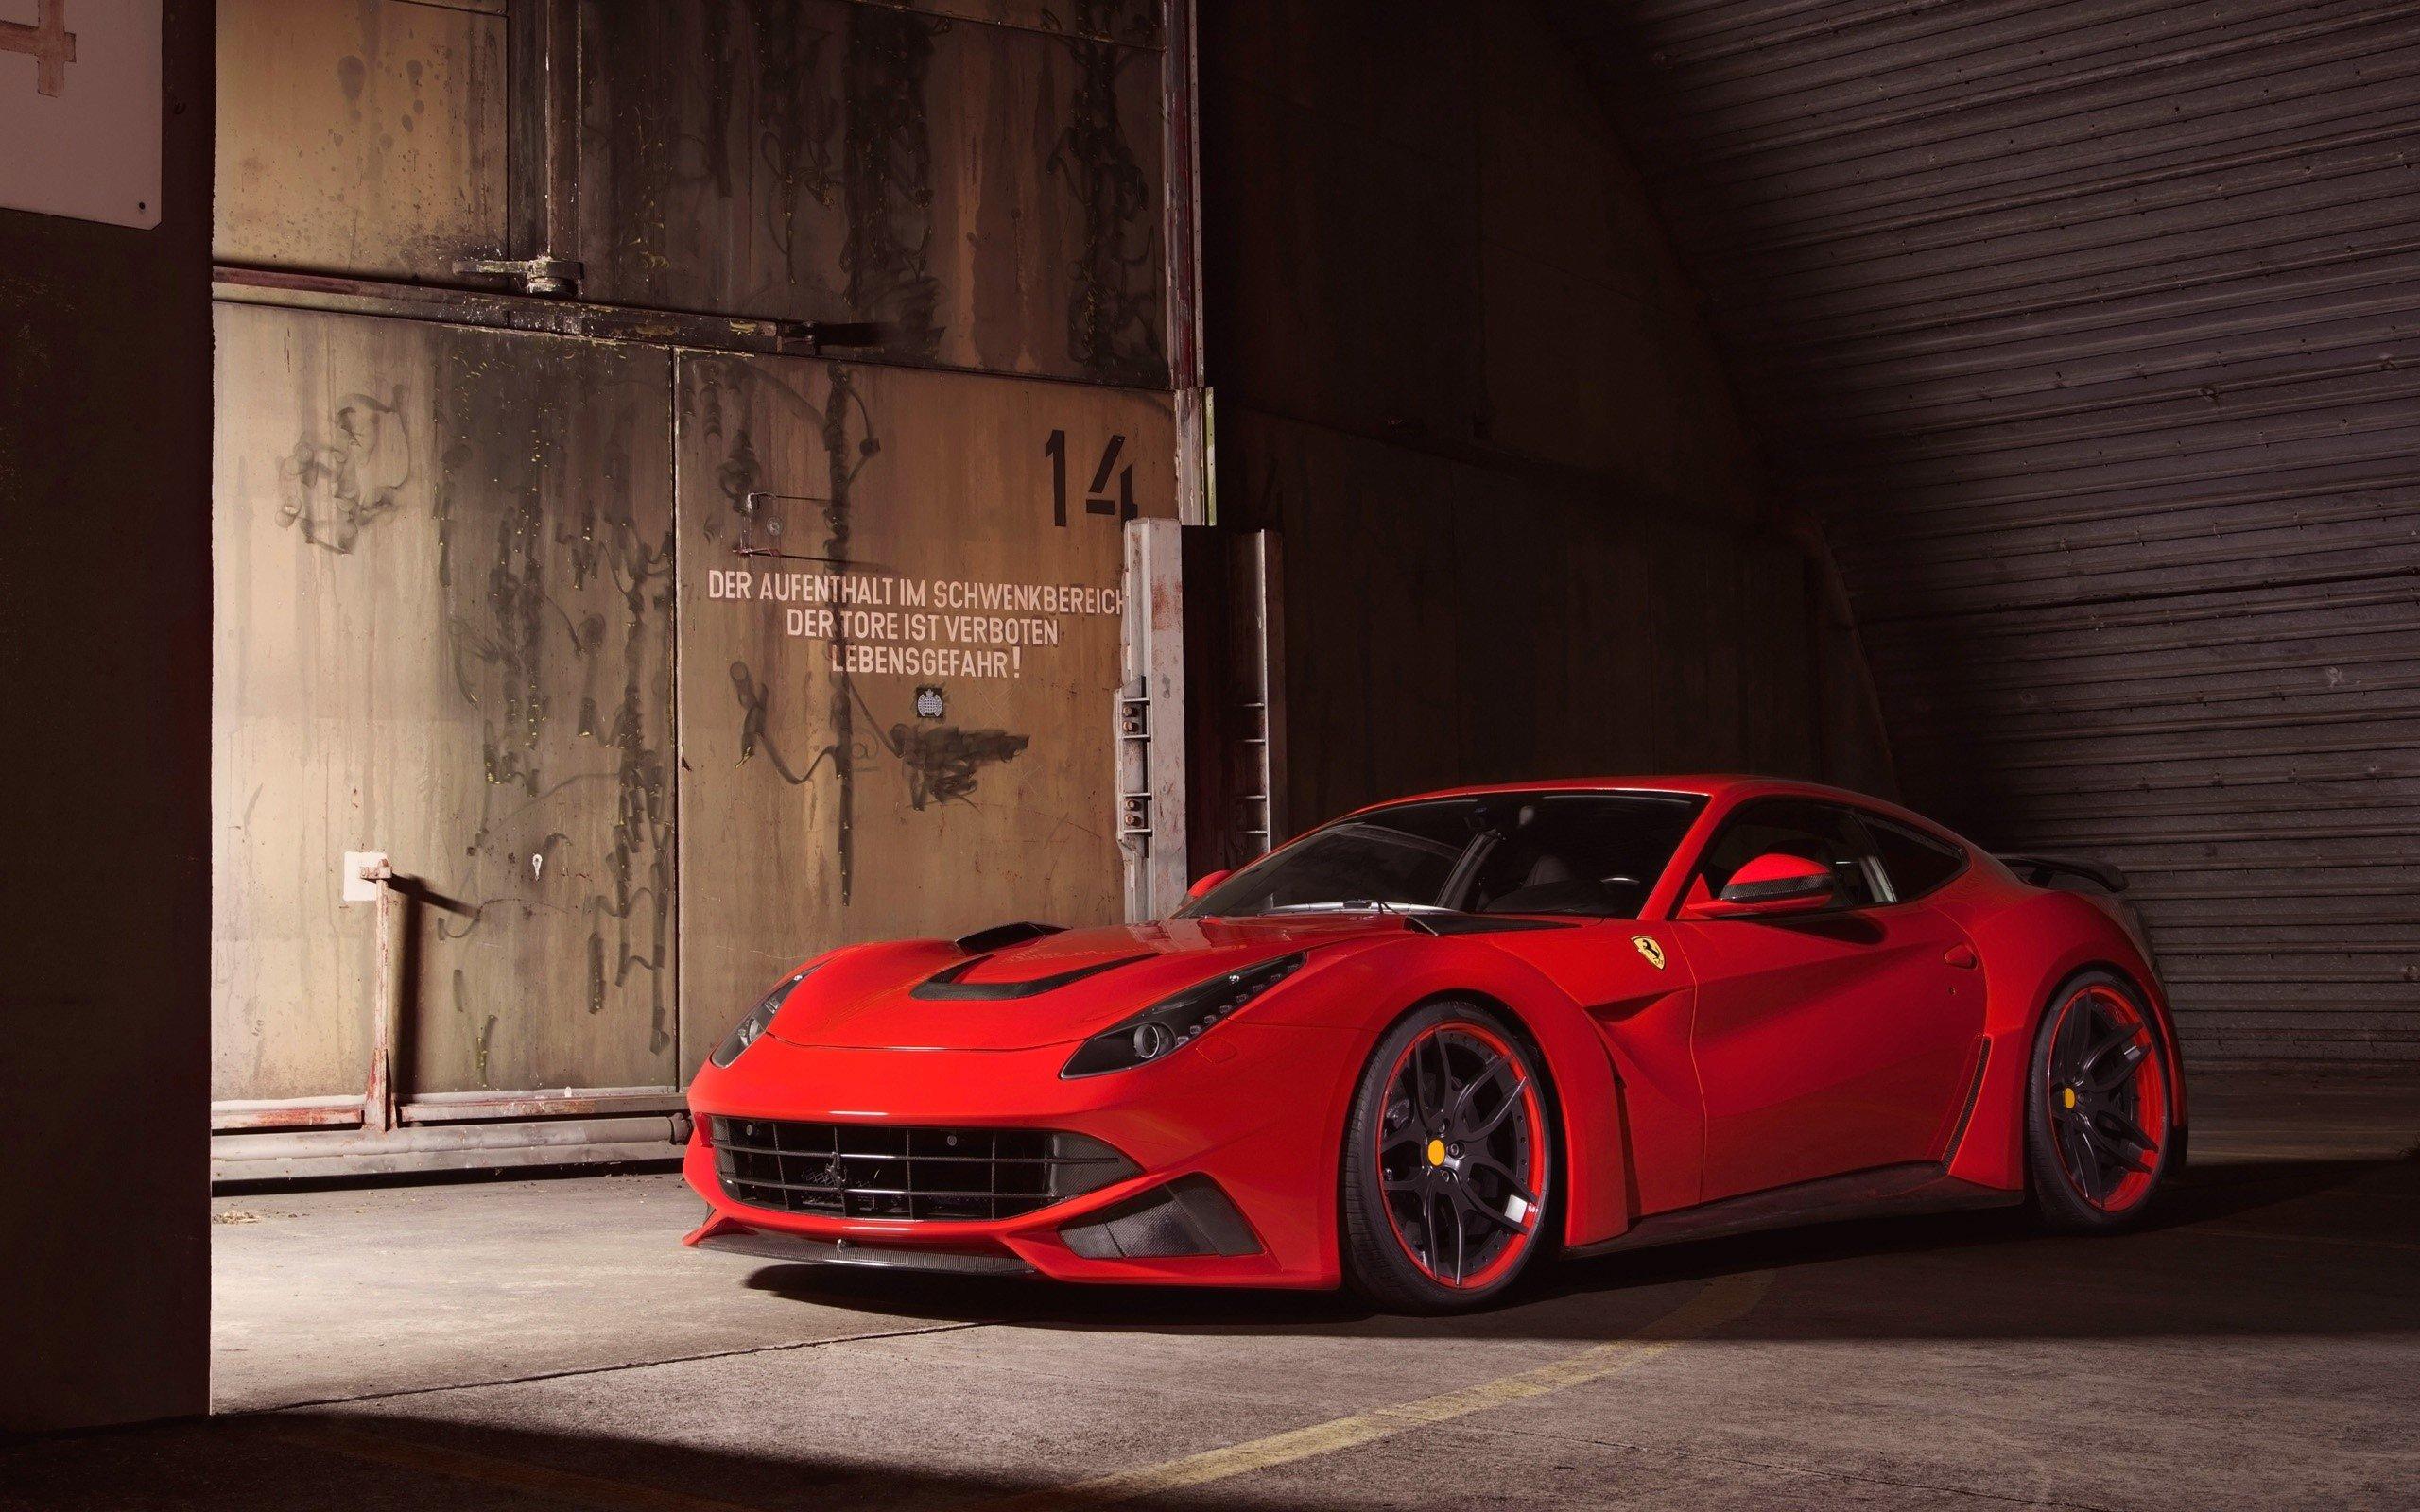 Fondos de pantalla Ferrari F12 Berlinetta Novitec Rosso N-Largo